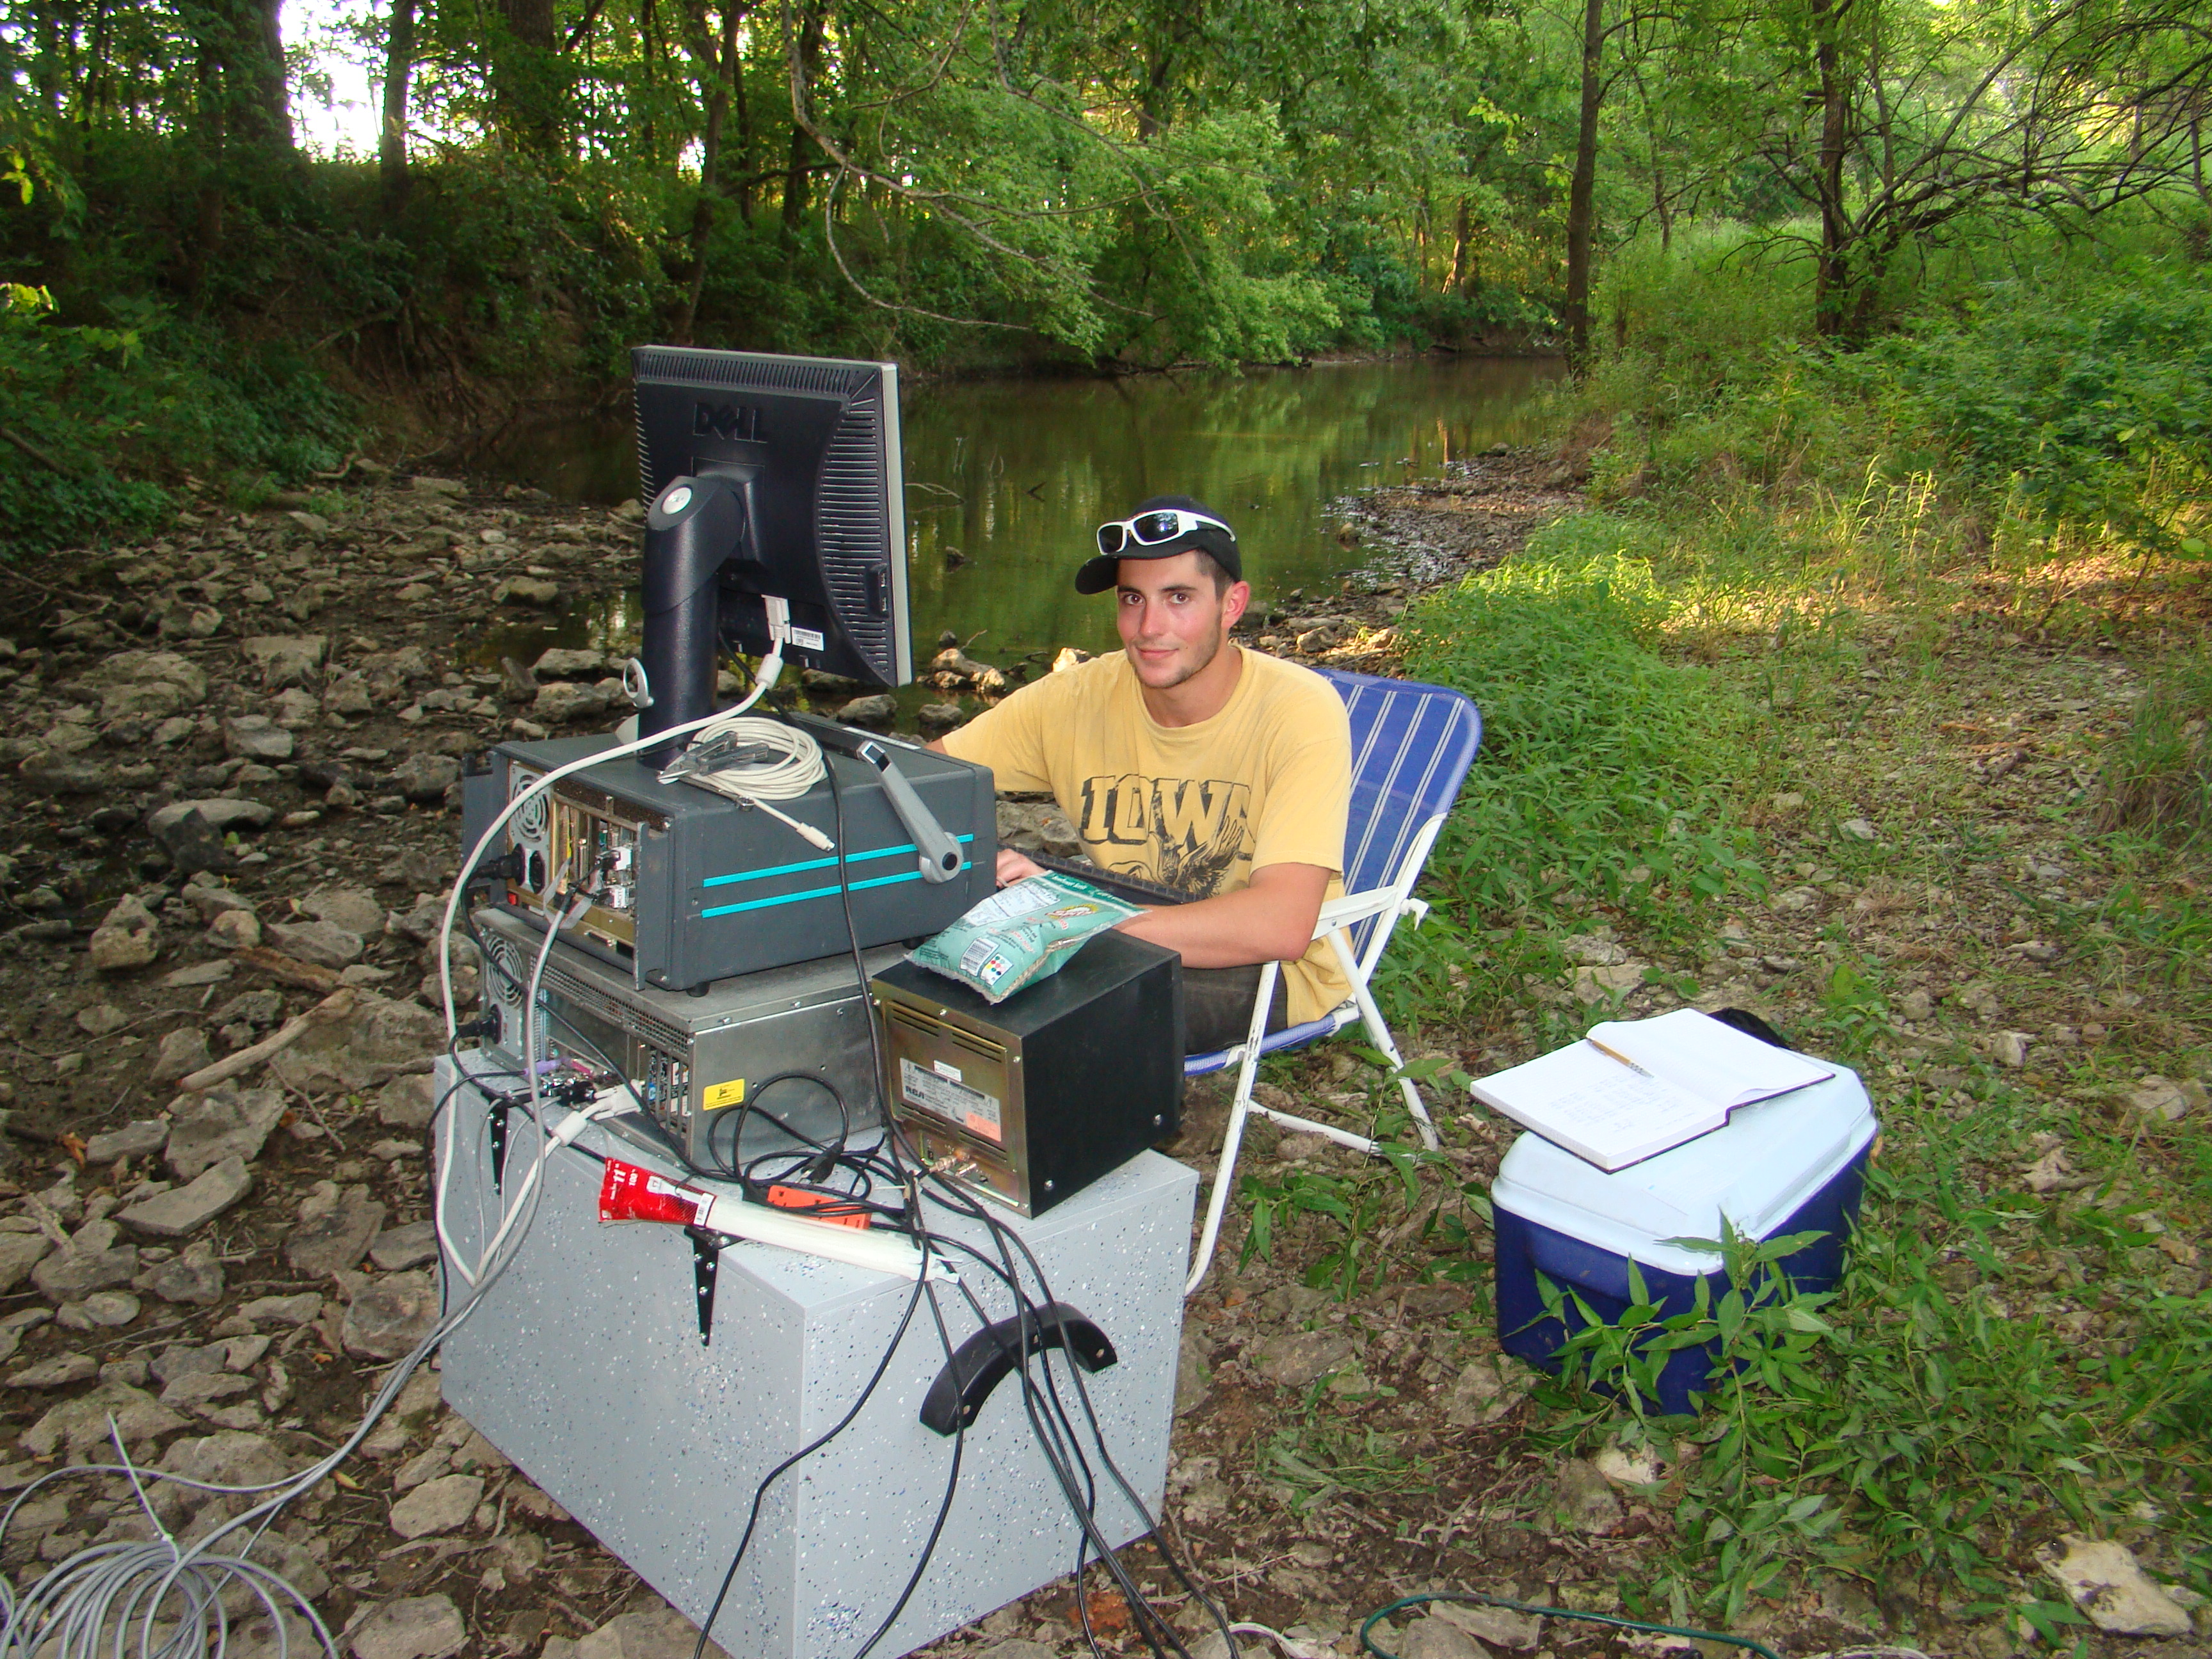 Sean Plenner working in the field in Kansas.